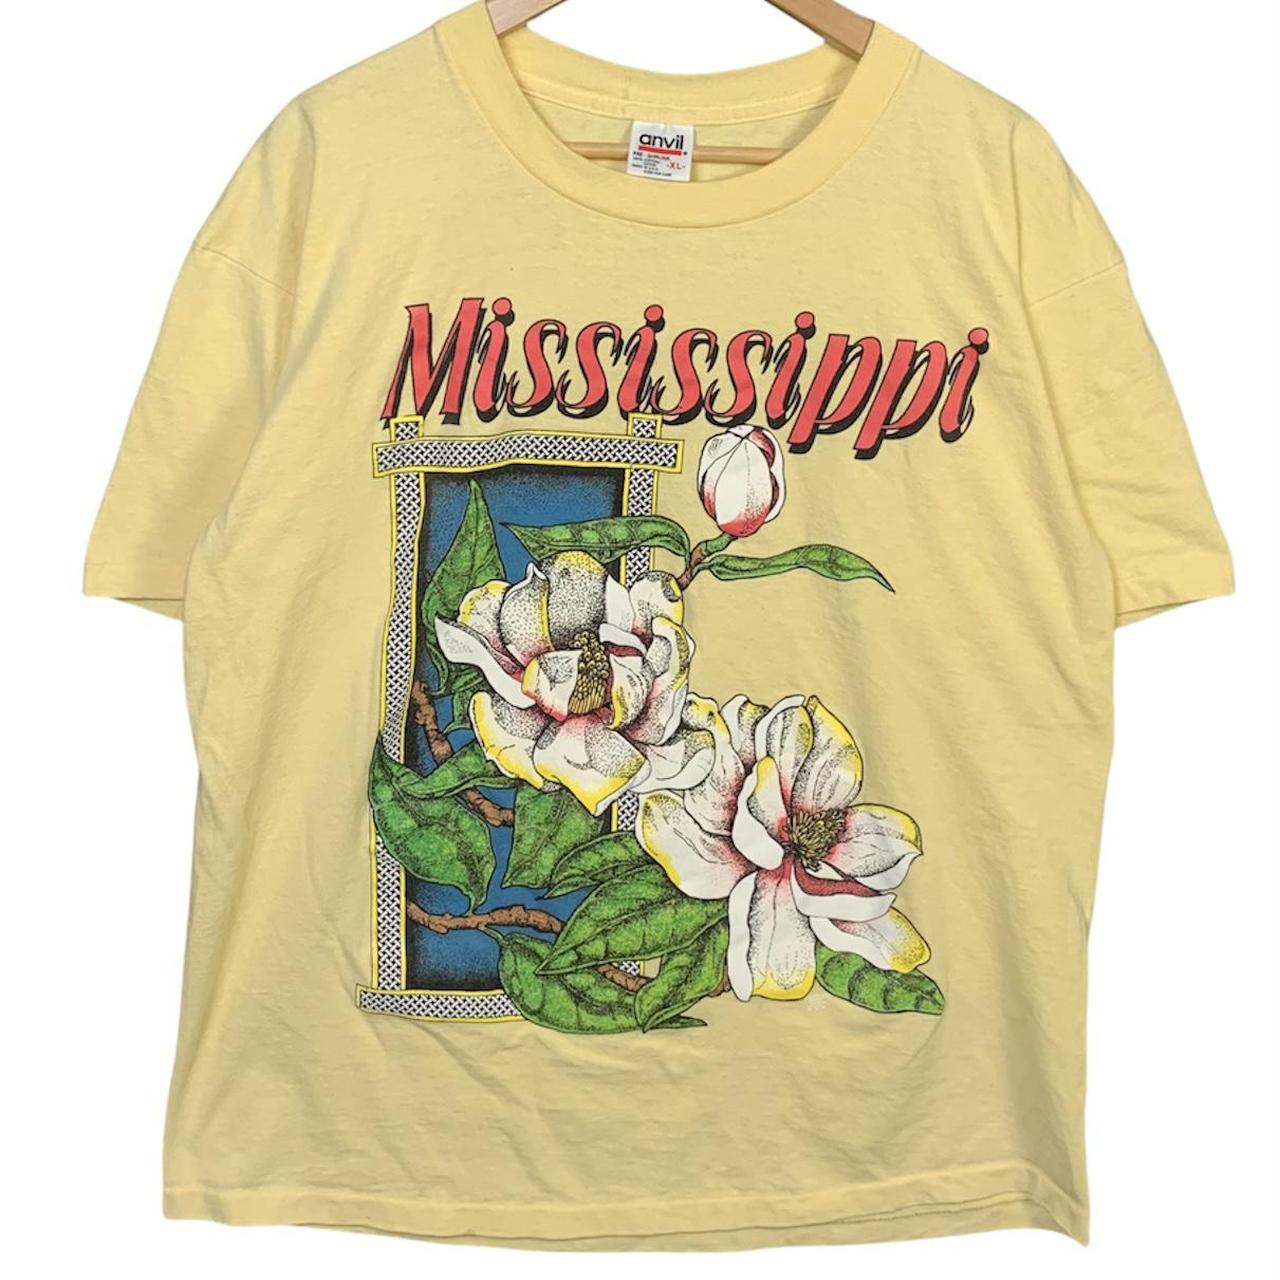 Product Image 1 - Vintage 1990s Mississippi Destination Tee!